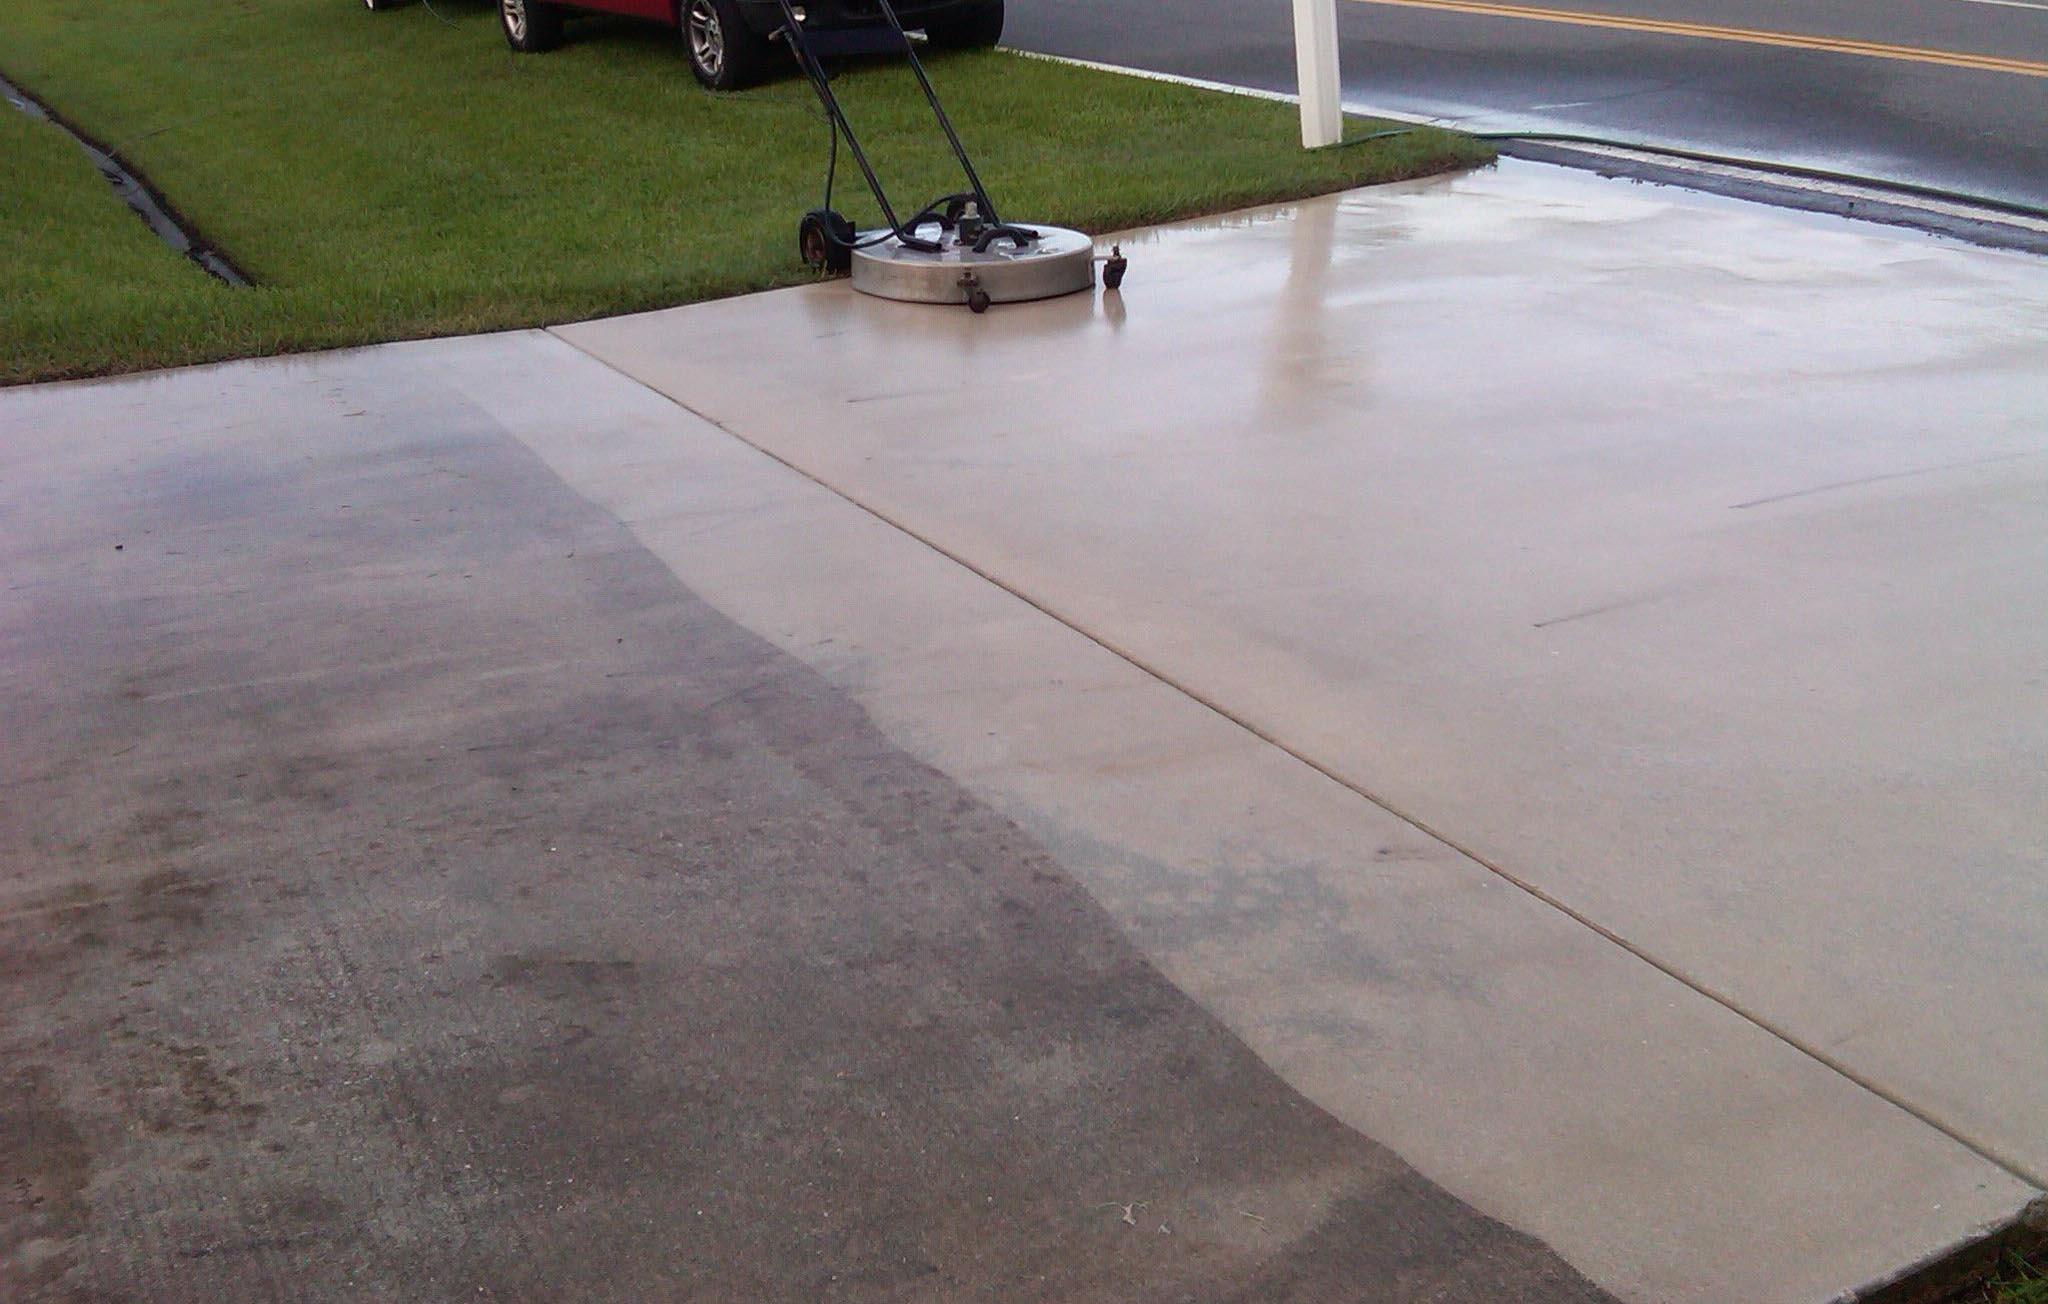 Concrete Power Washing and Sealing, Driveway Power Washing St. Louis